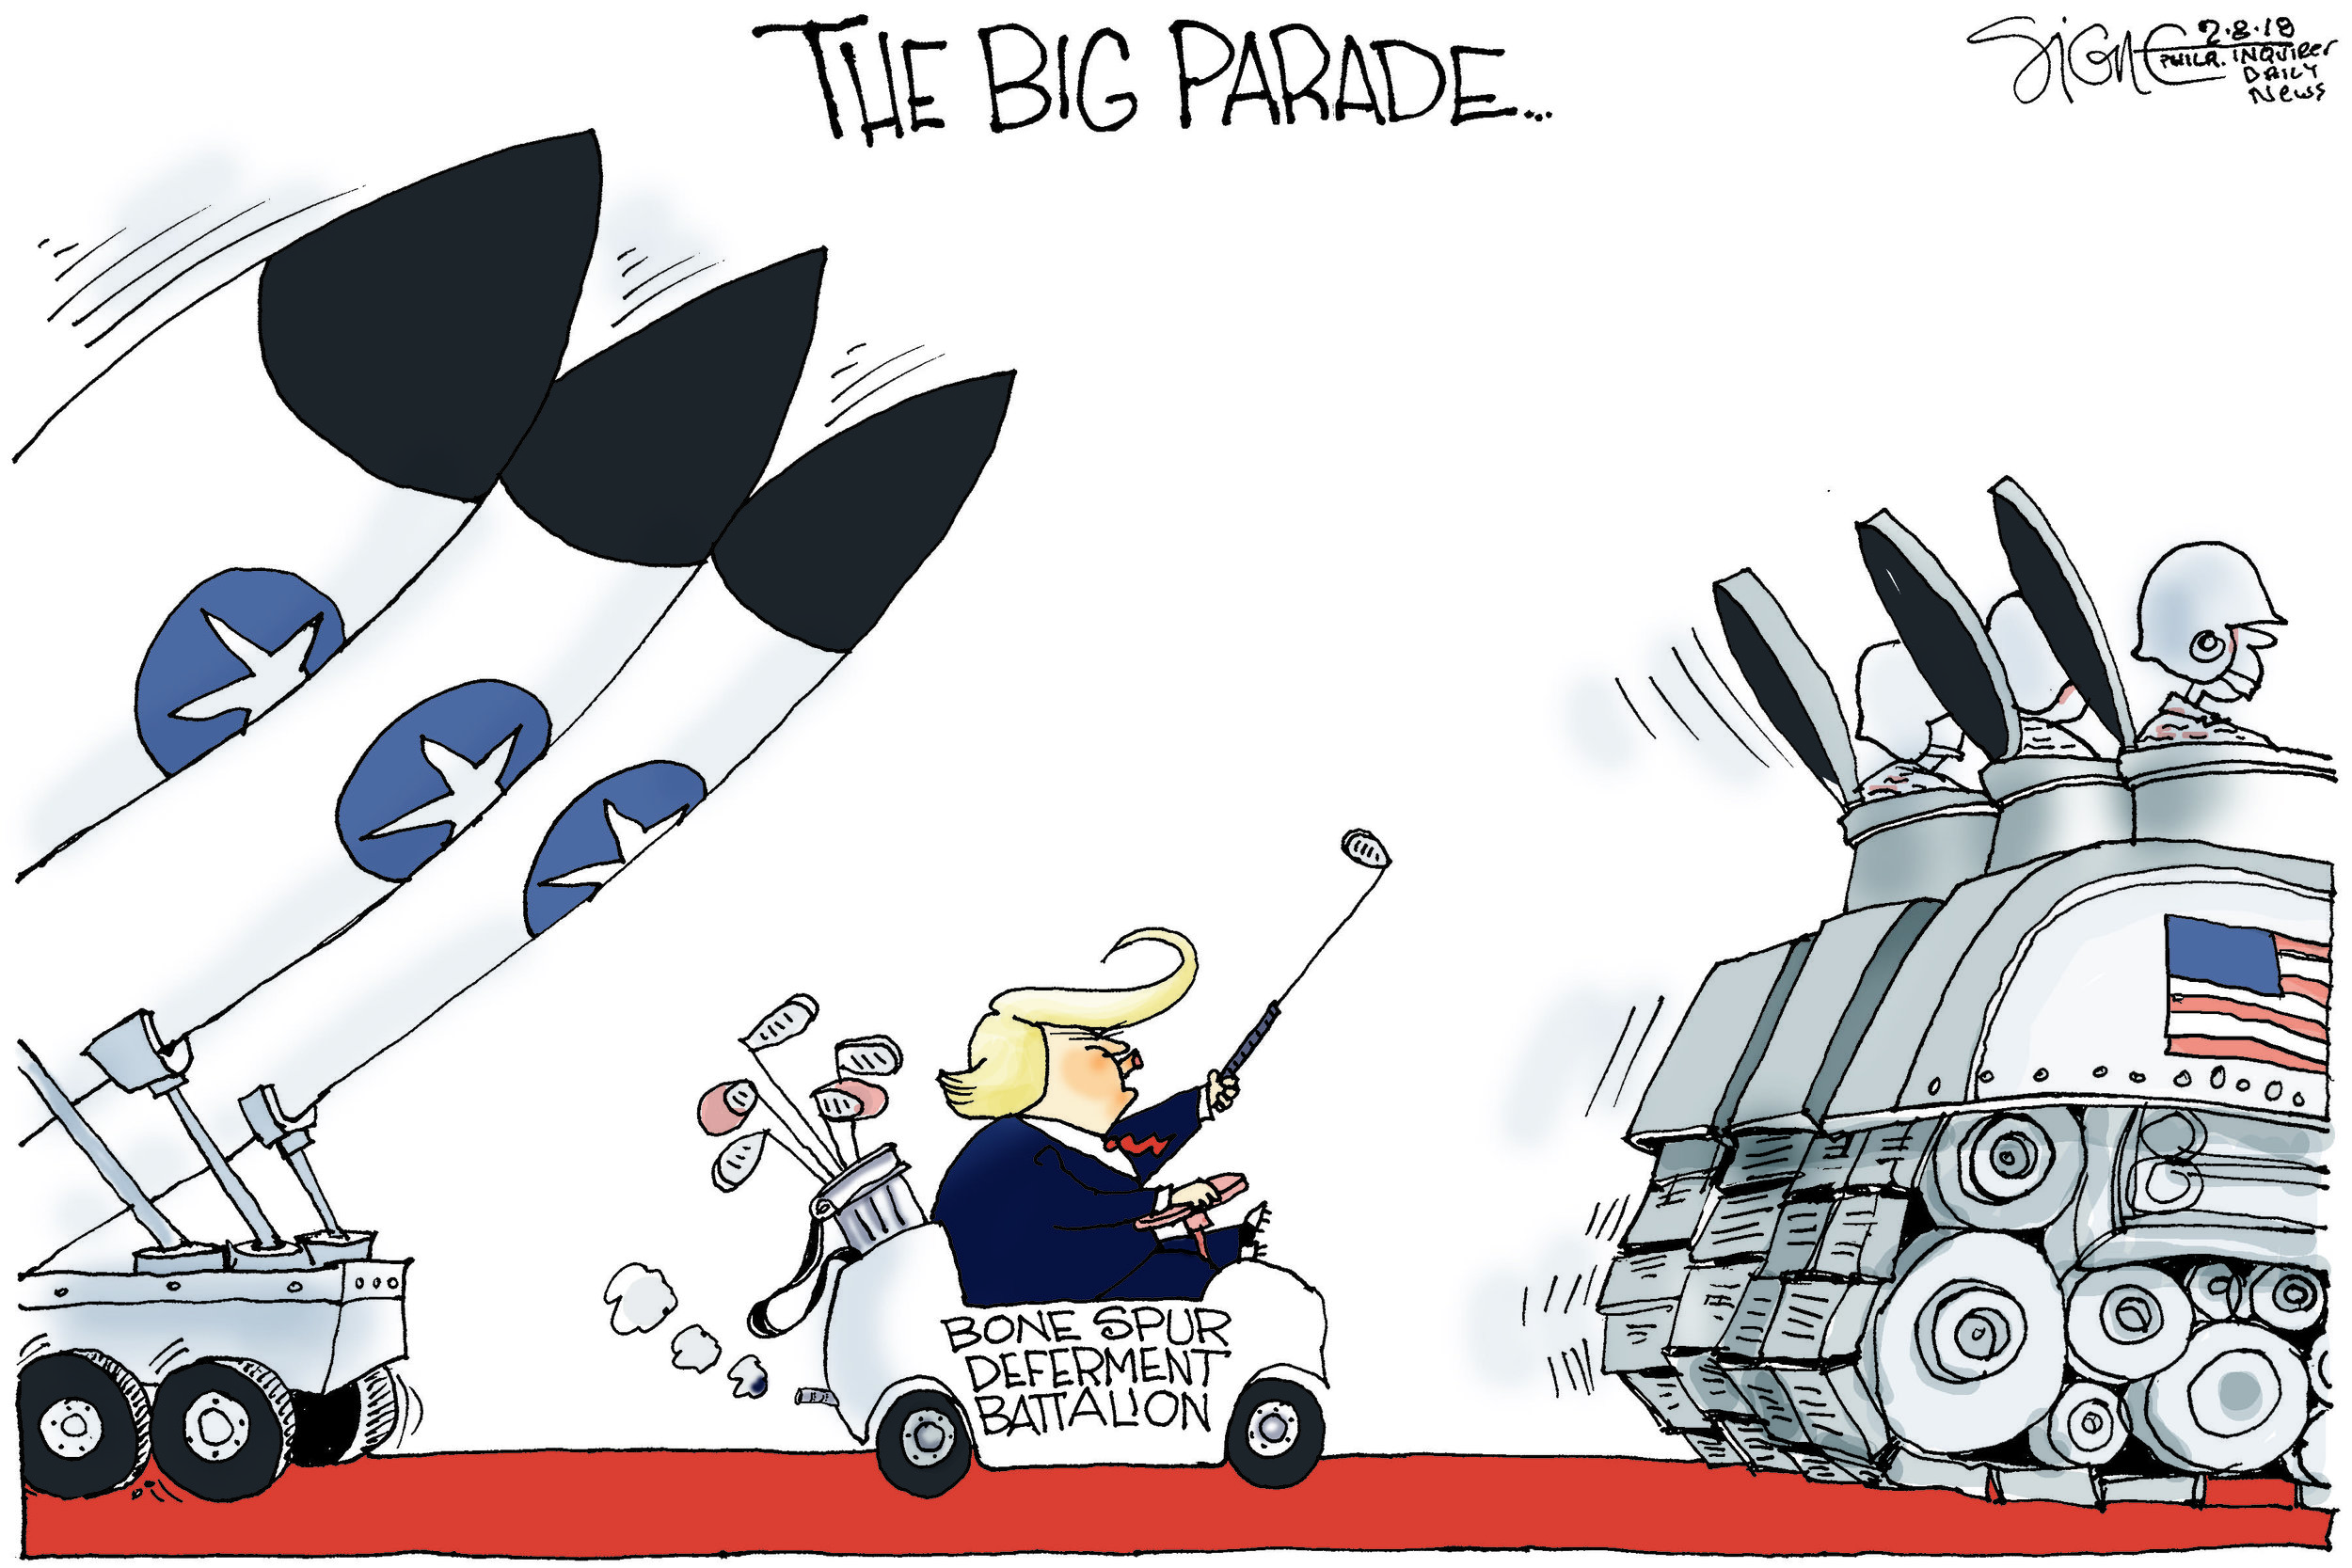 02-09-18 Trump_s Parade.jpg